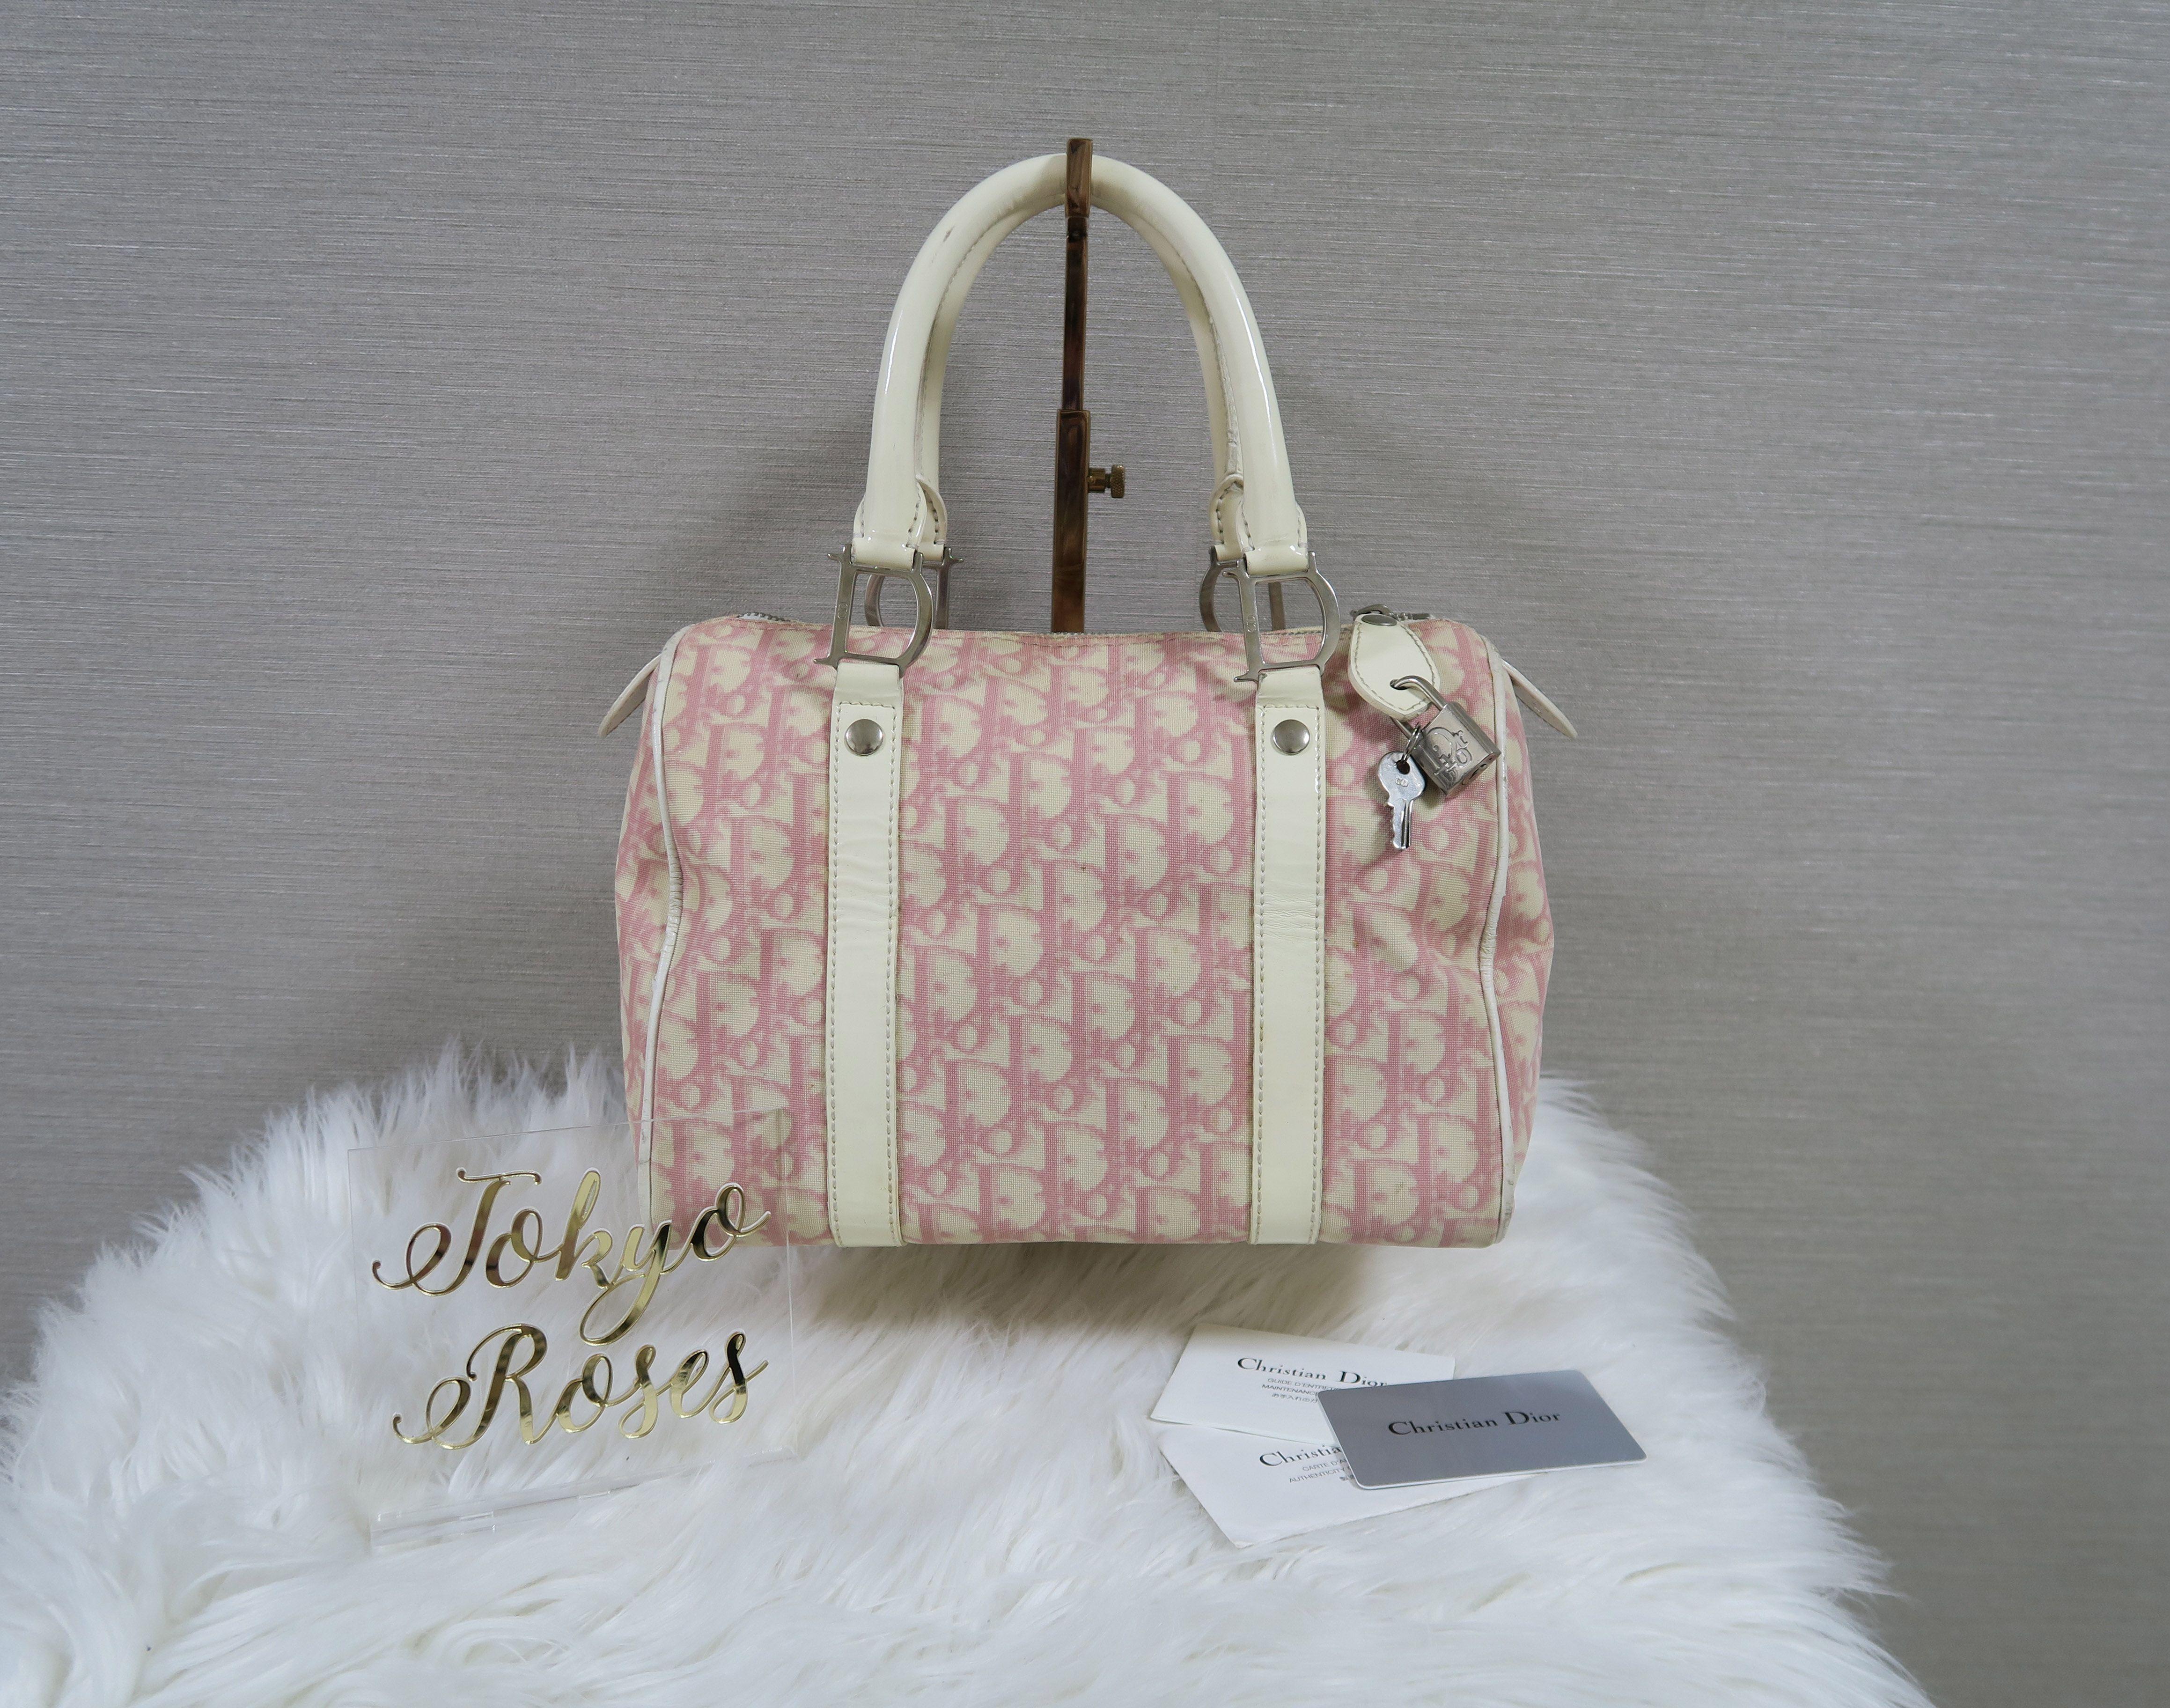 01ec7e02a105 Christian Dior Pink Trotter Logo Print Boston Bag Handbag